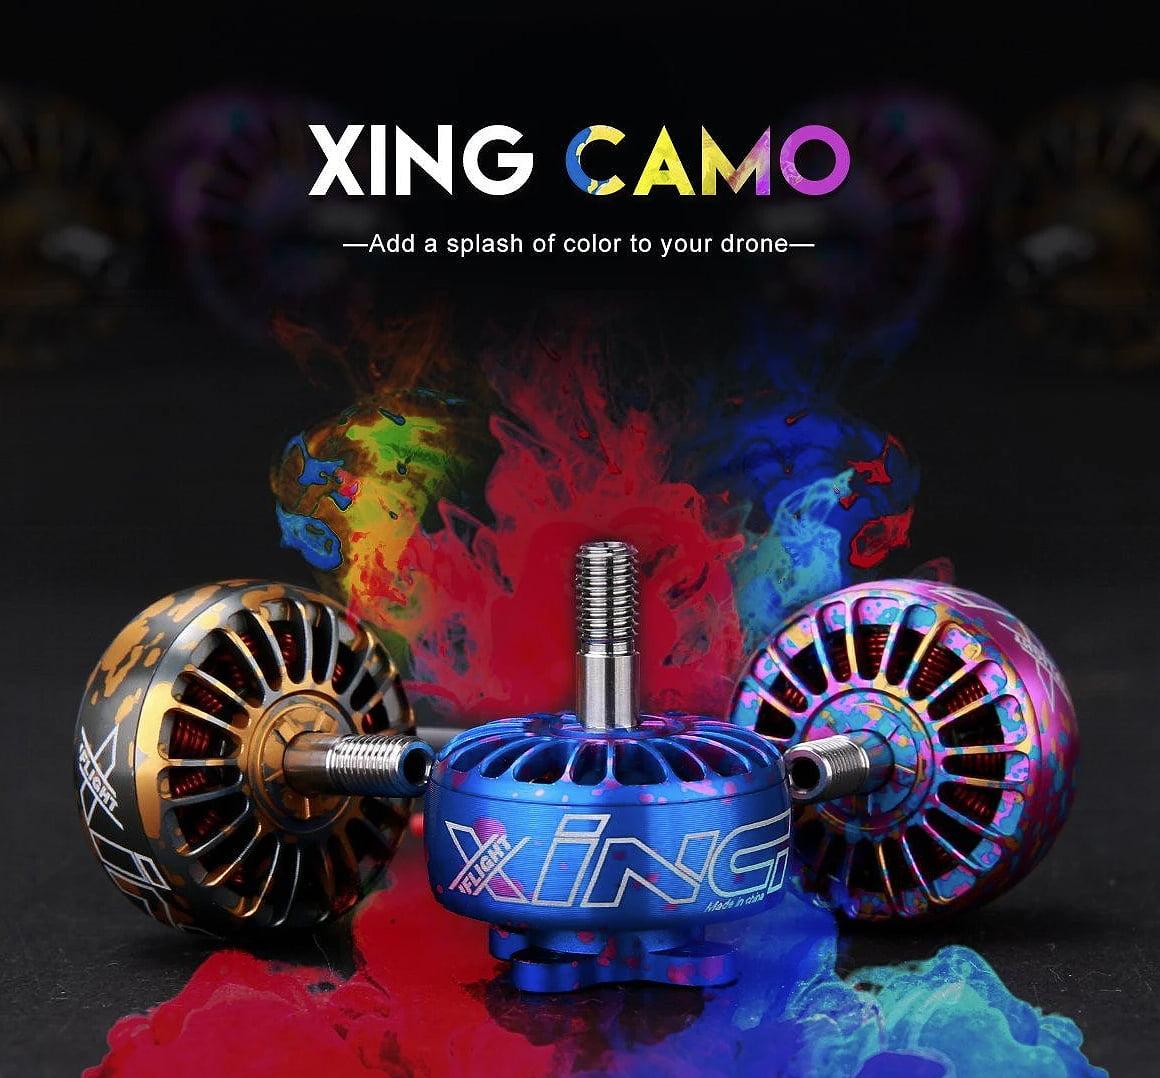 iflight xing camo 2207 2208 2306 race motor products description mantisfpv